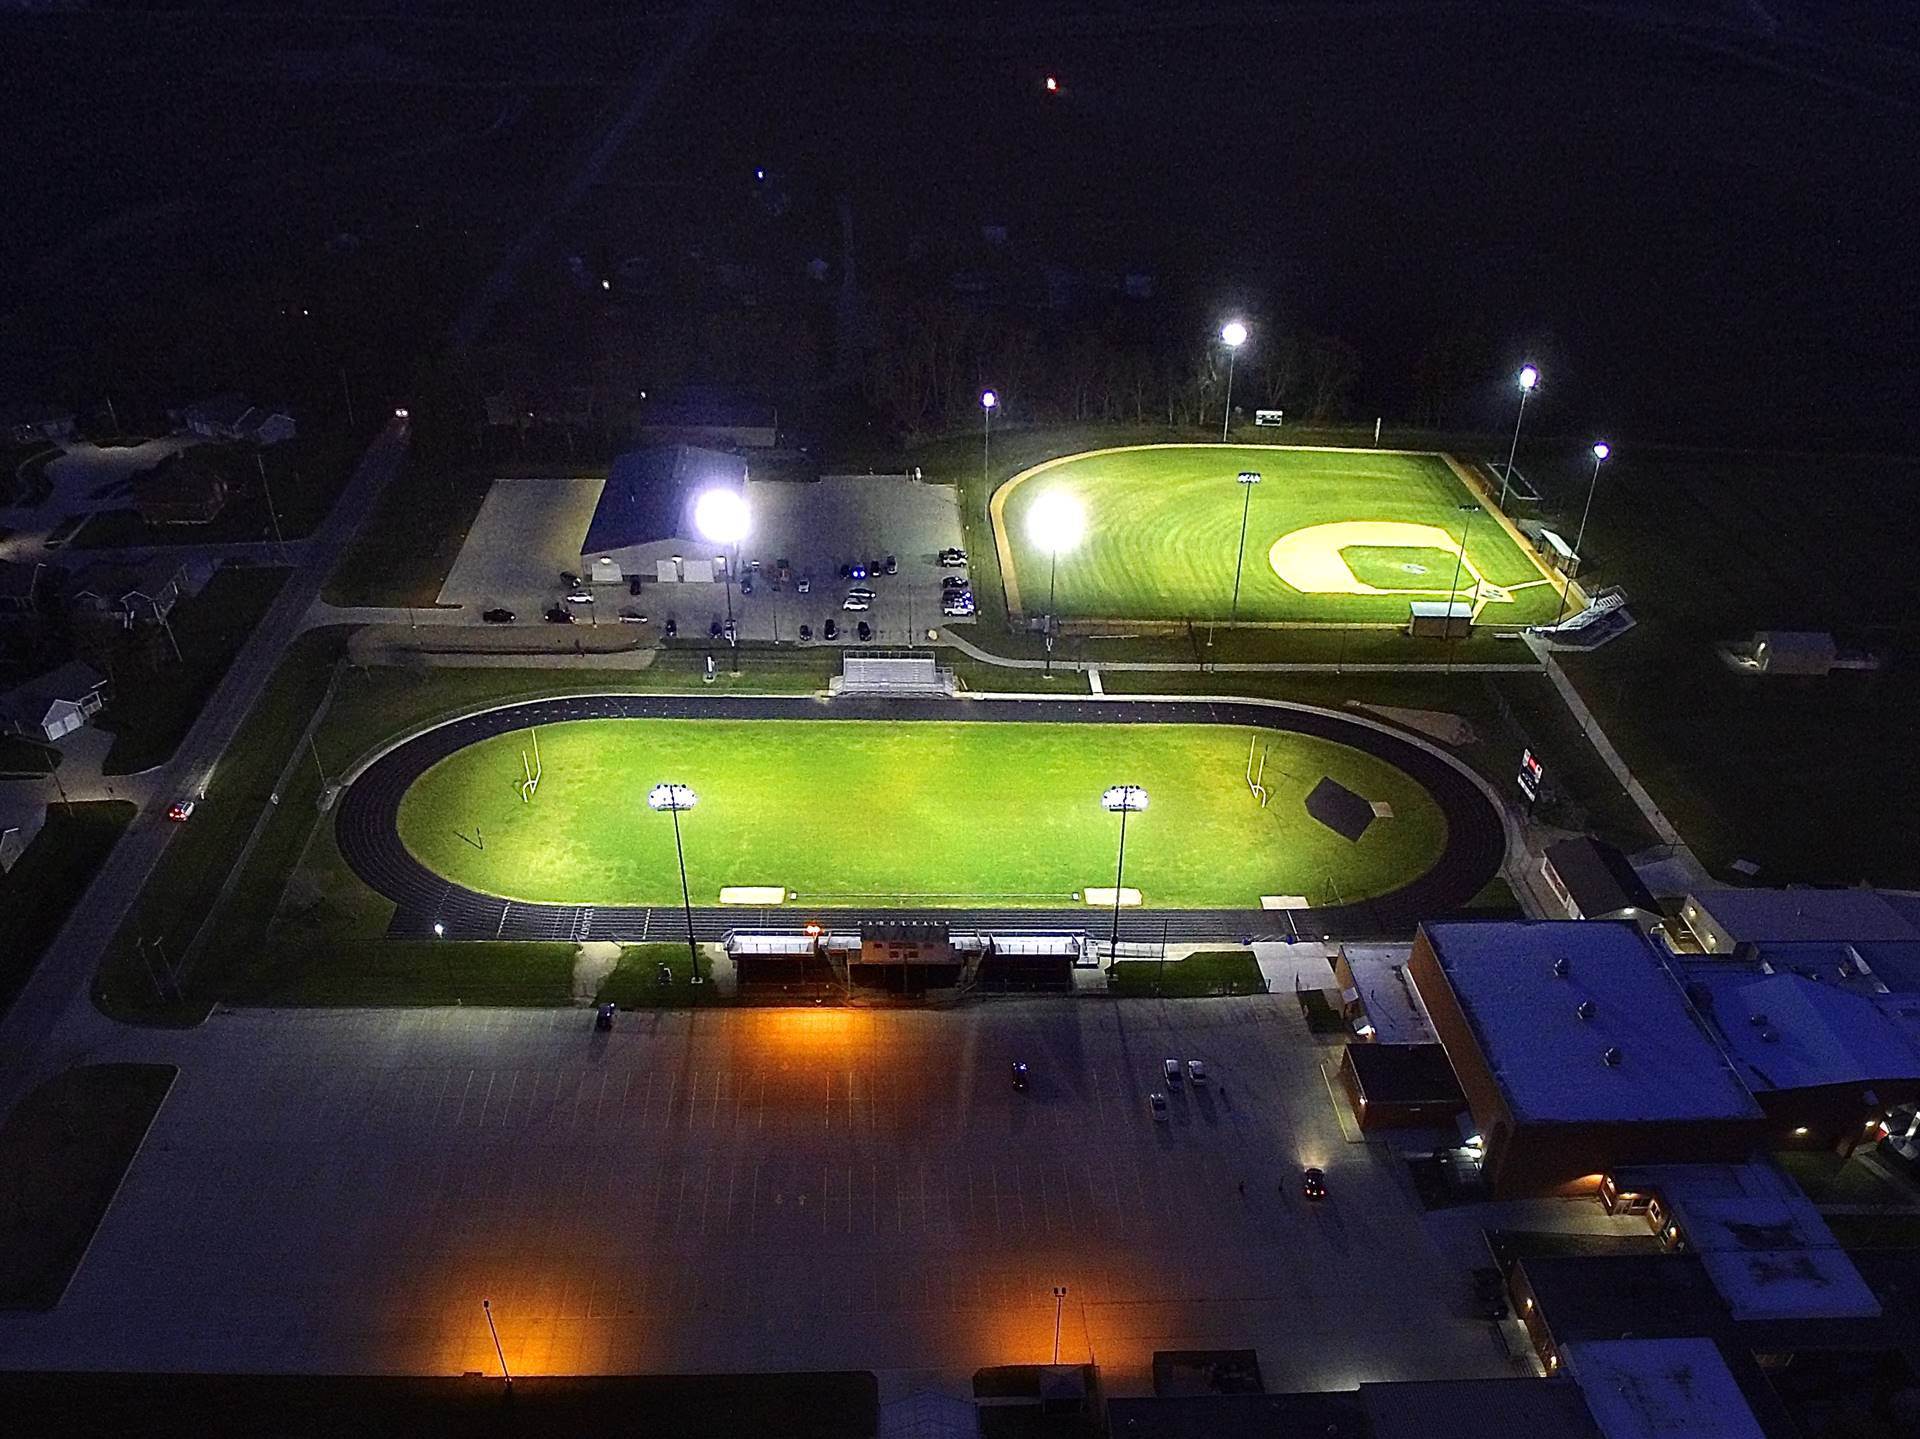 aerial evening photo of high school campus